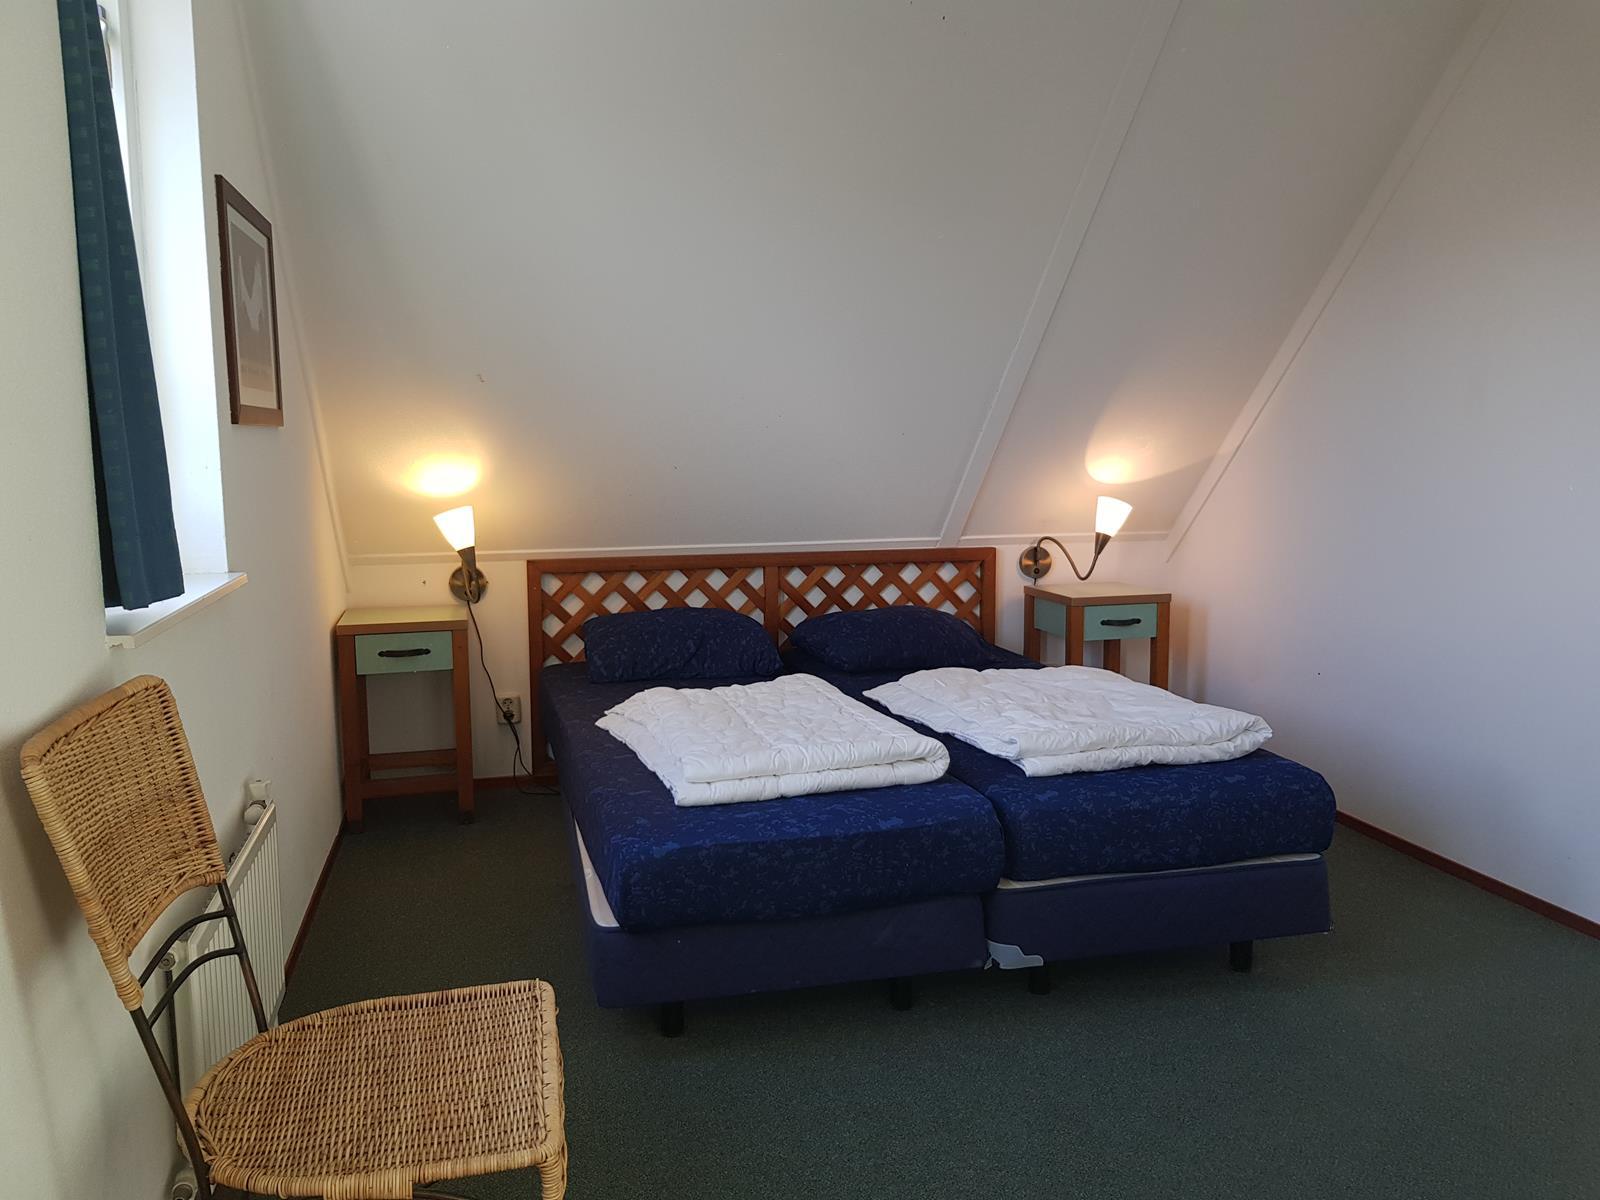 Vakantiehuis te koop Zeeland Bruinisse K155 (11).jpg